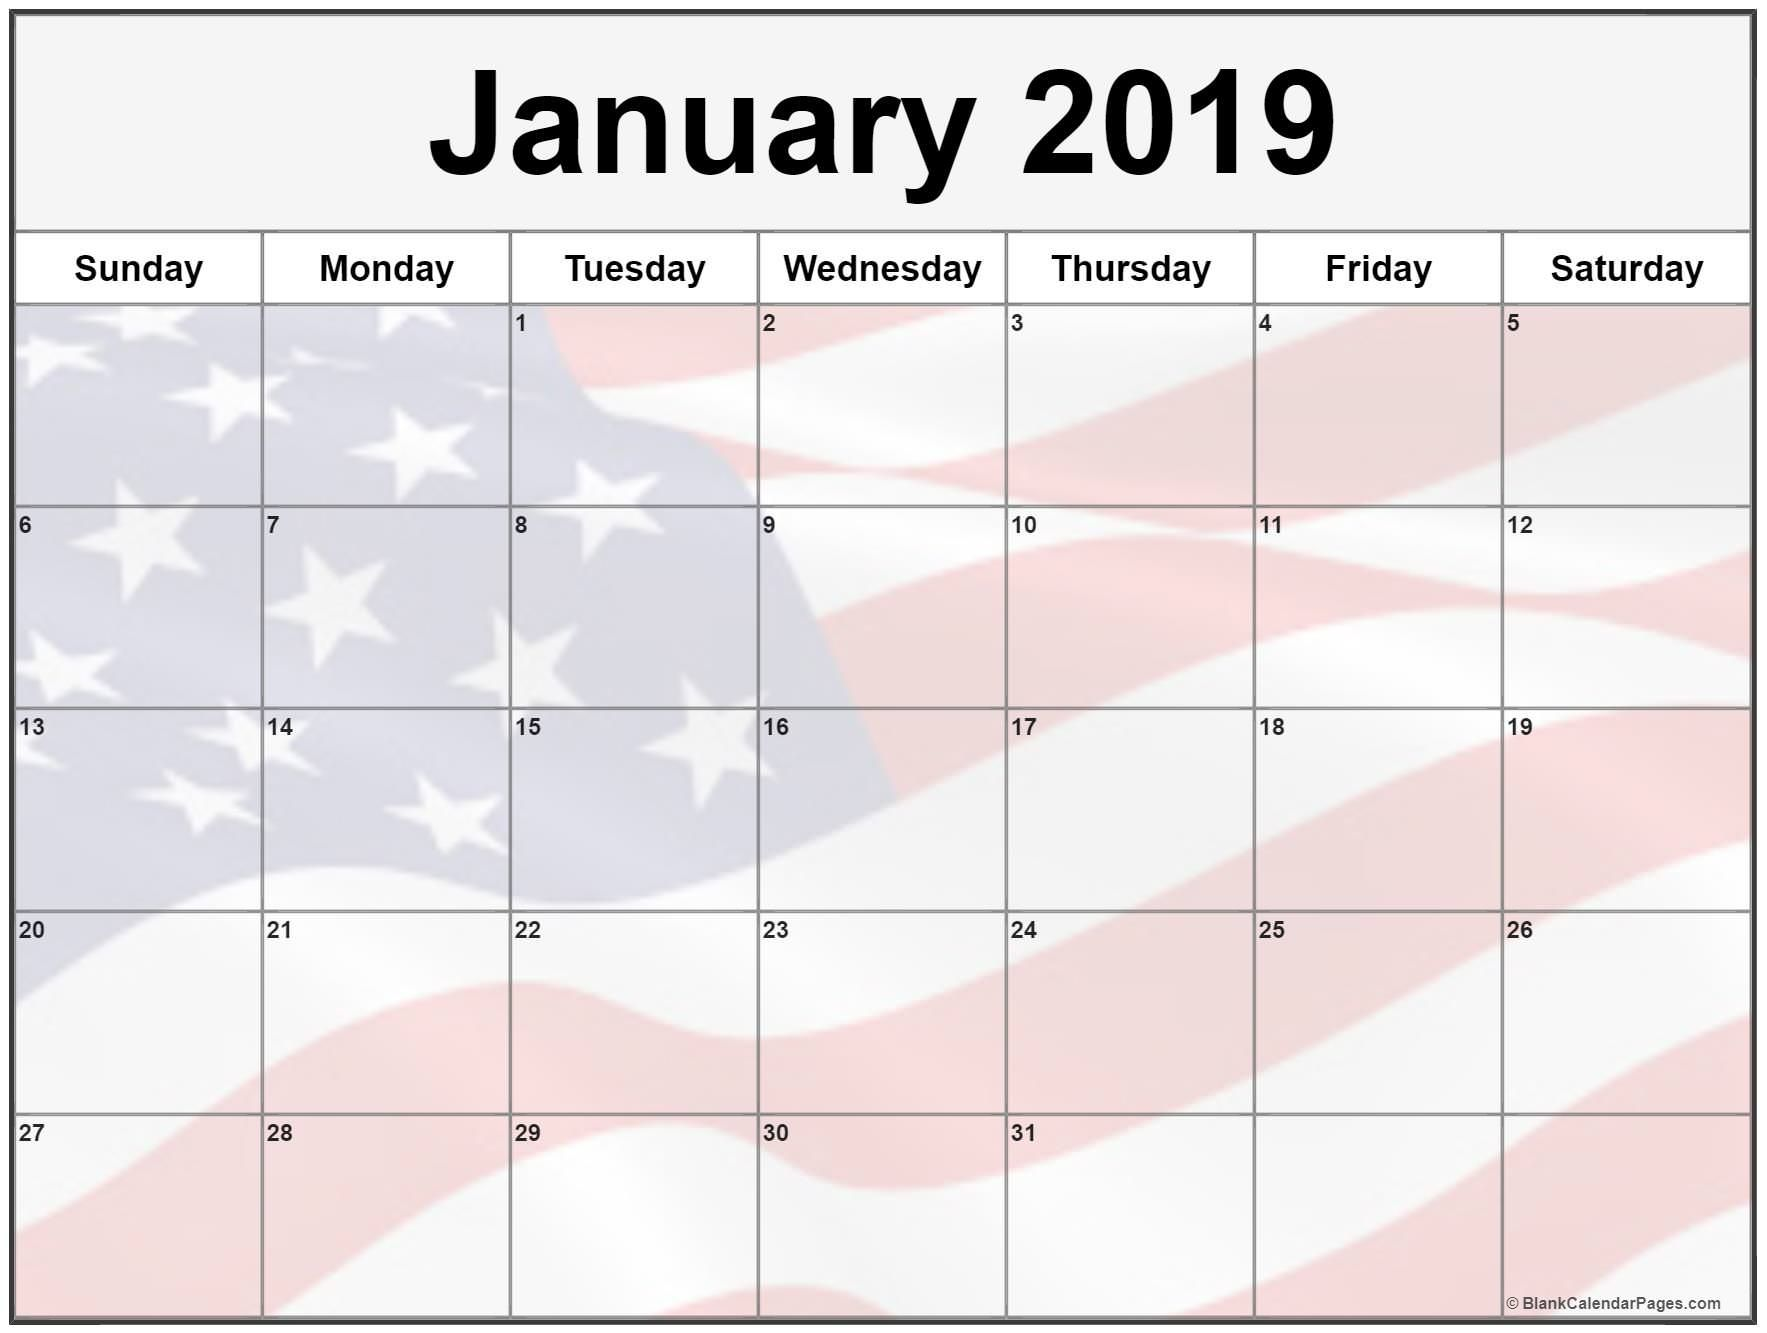 January 2020 Calendar Usa Holidays Federal National Bank